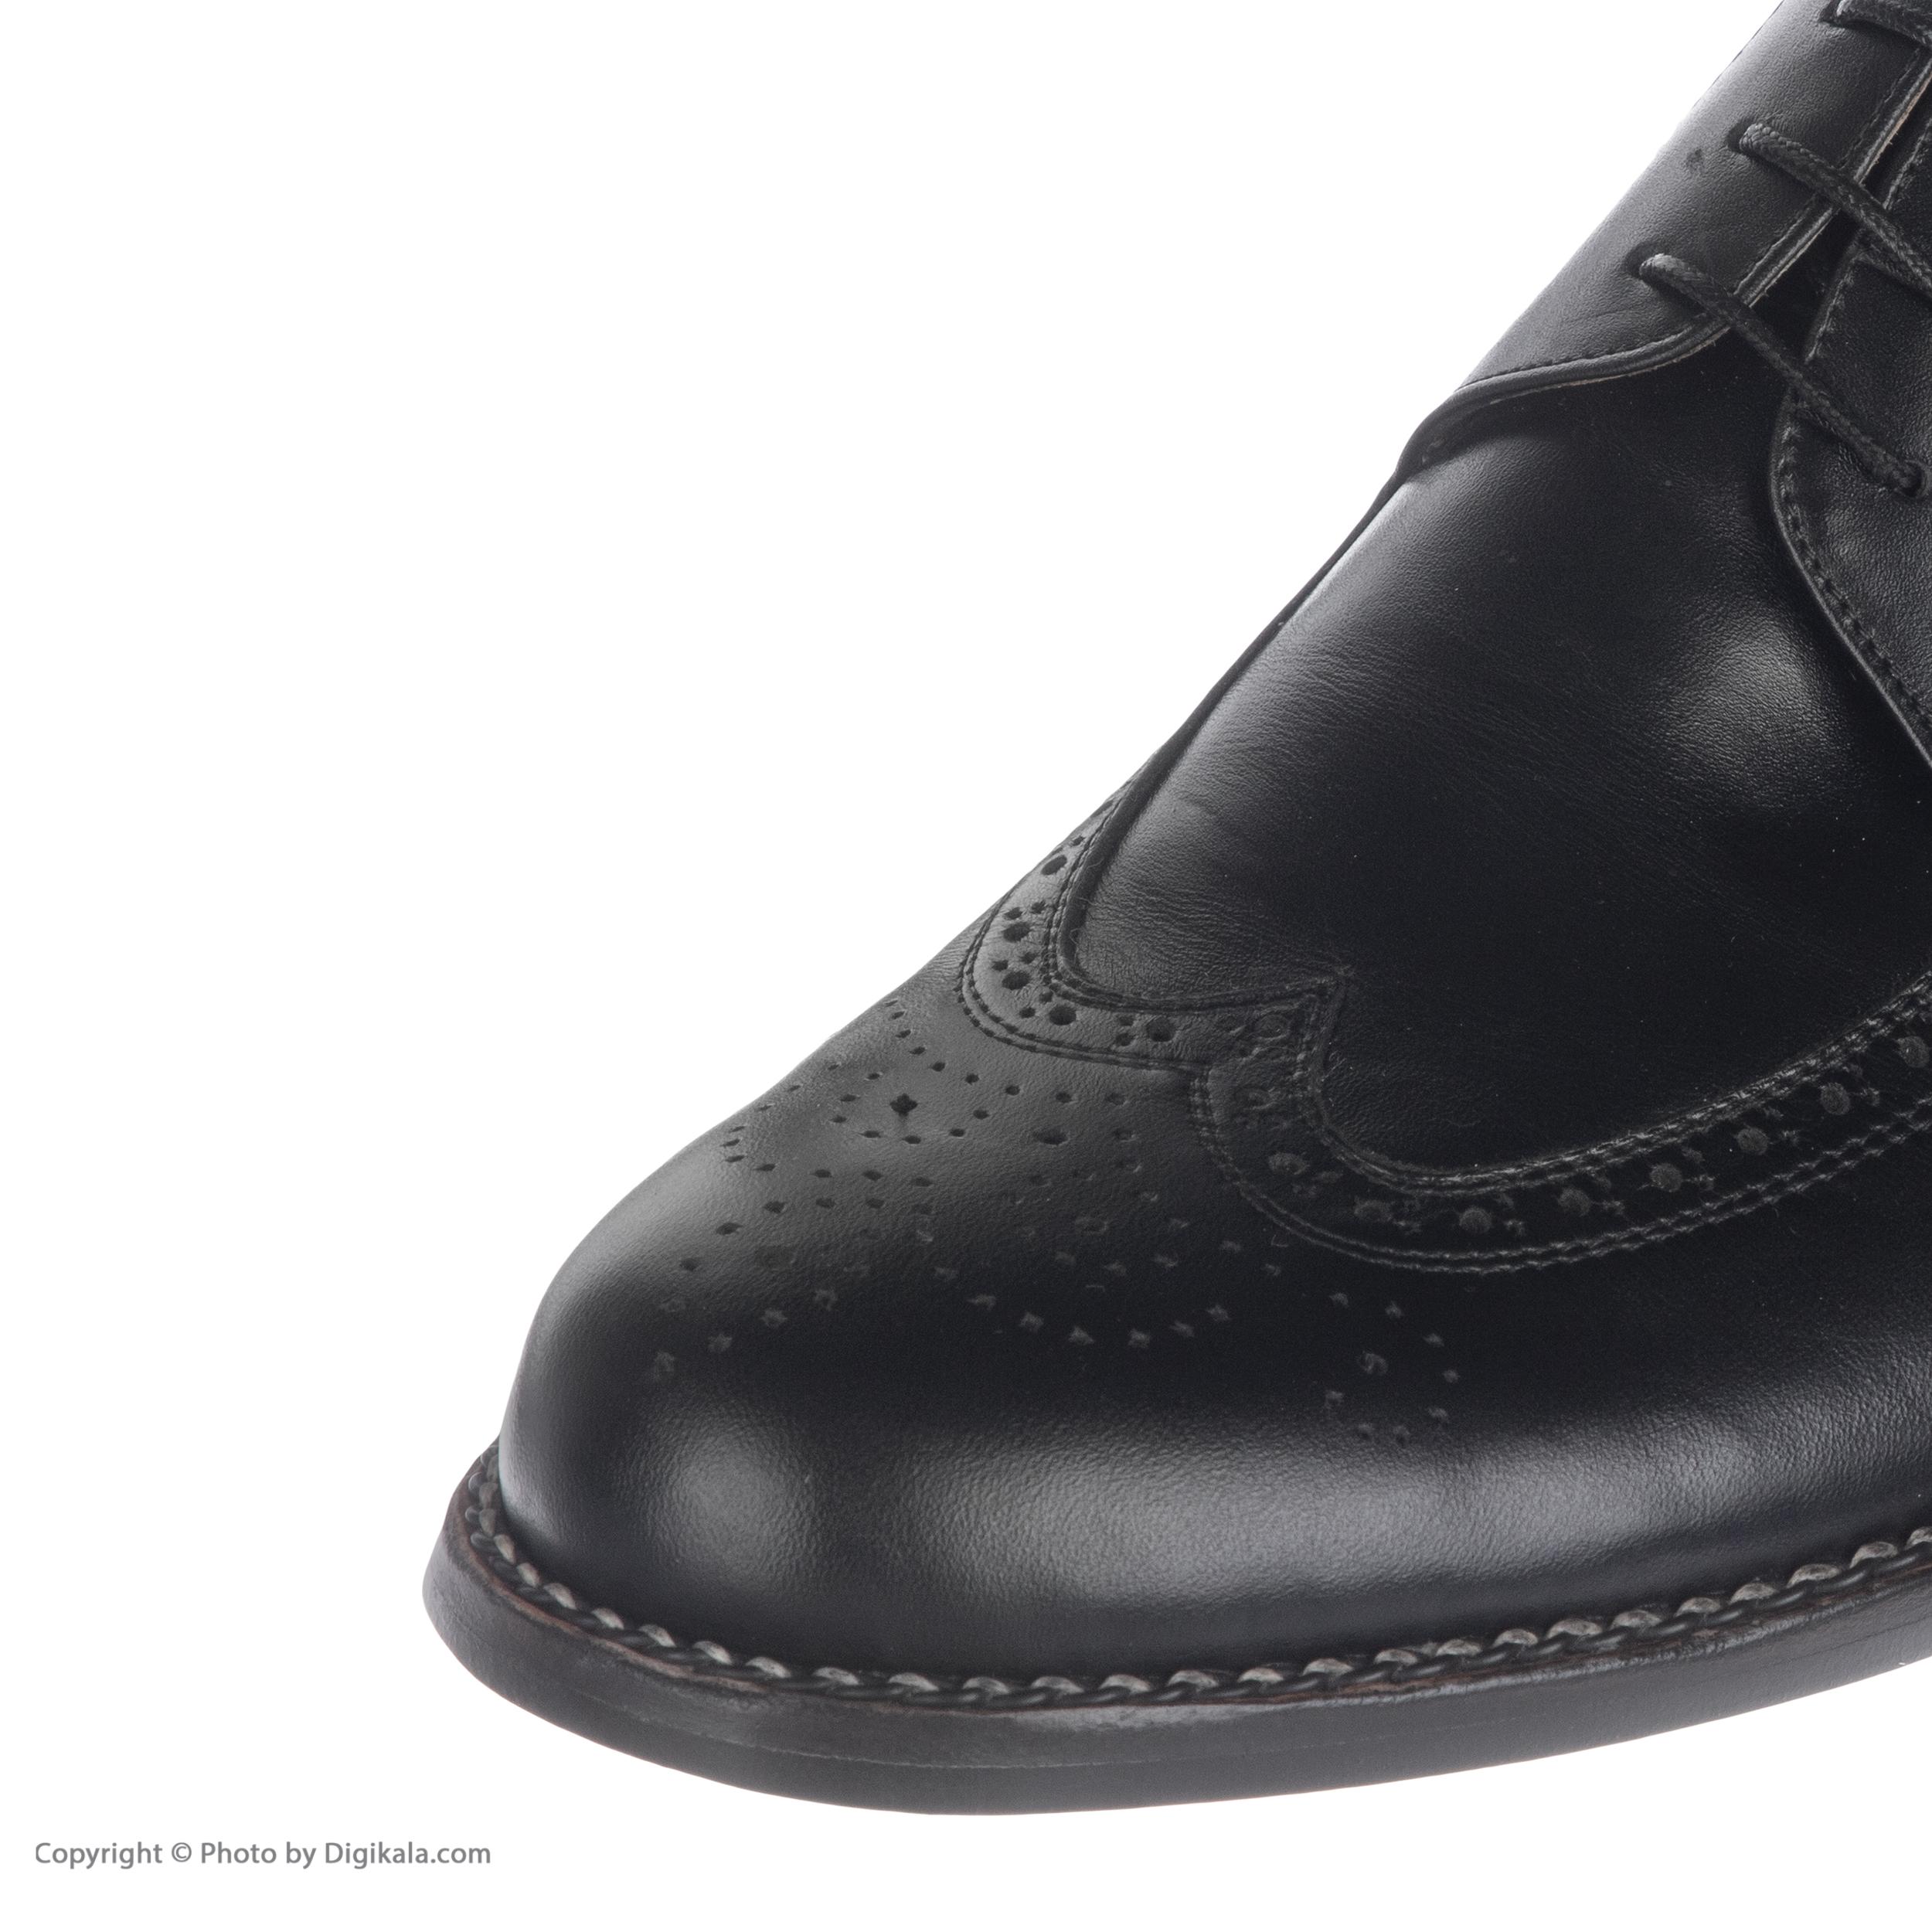 کفش مردانه نظری کد 401 -  - 6